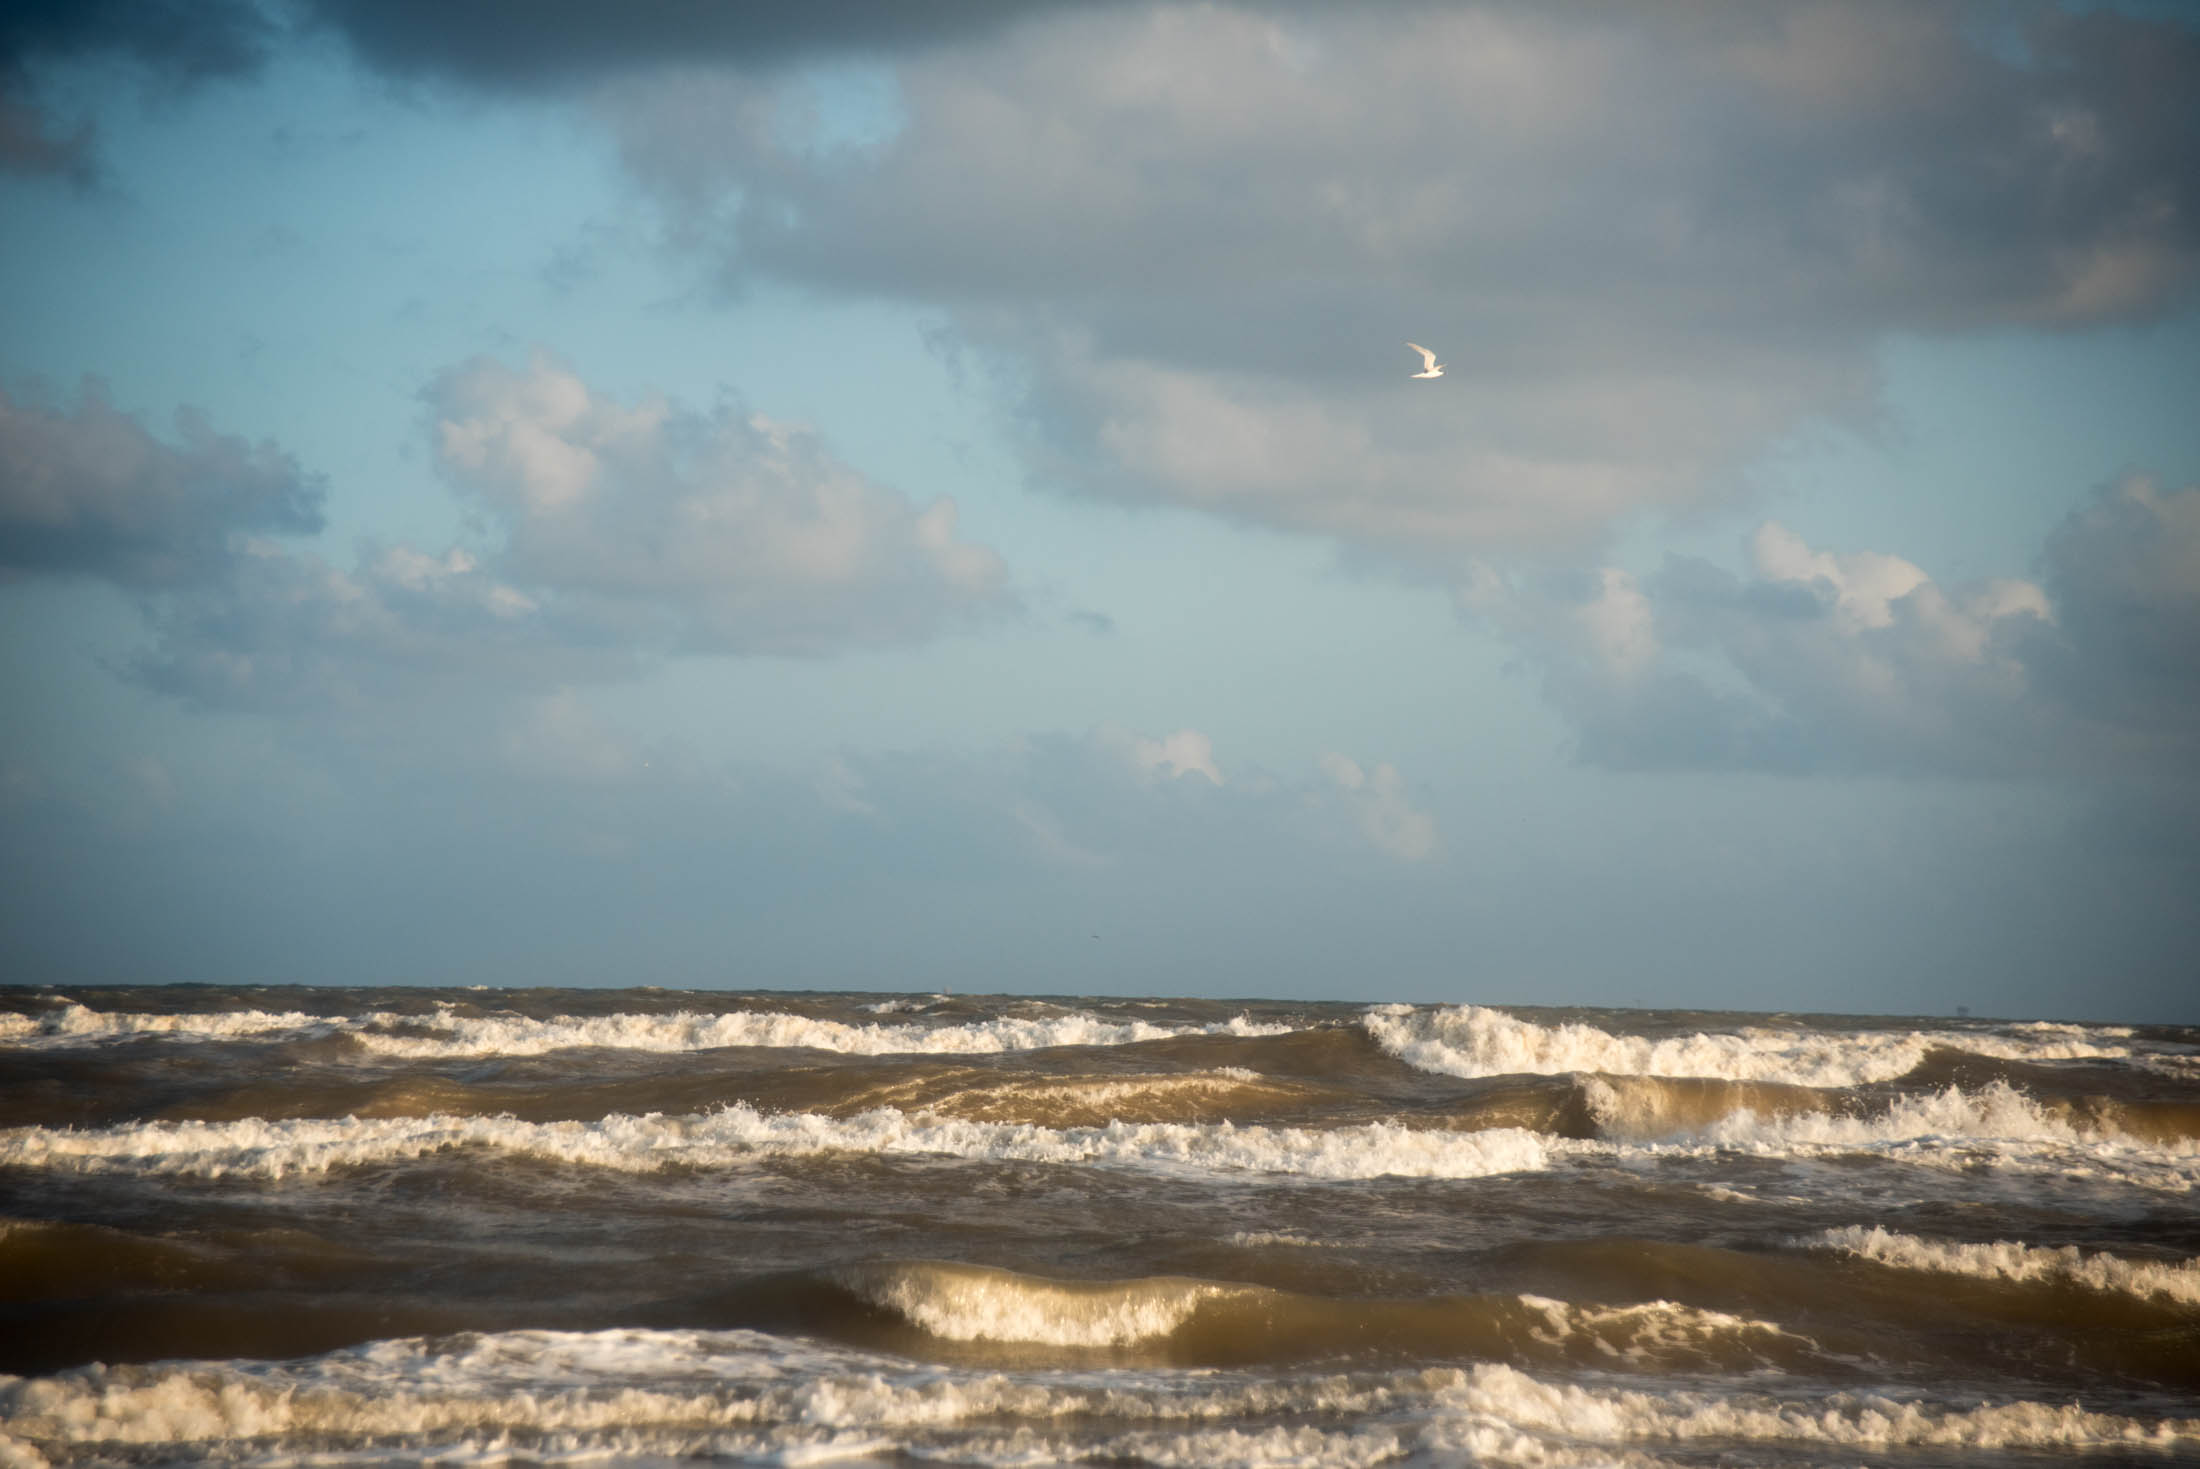 matagorda-beach-july-fourth-16